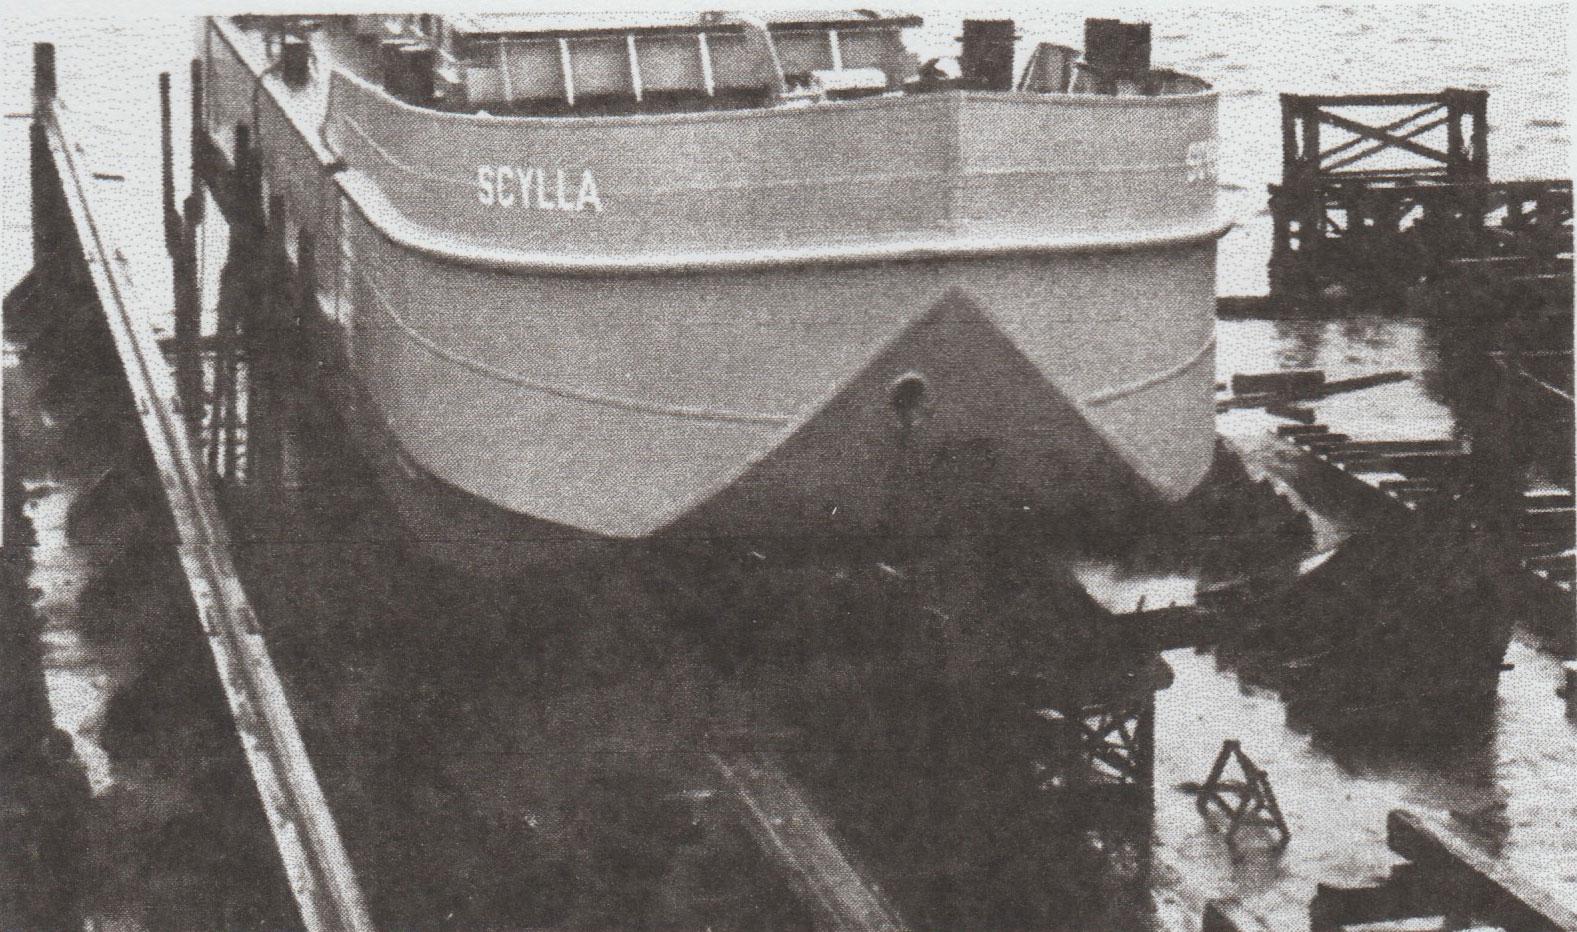 Bnr. 980 en 981: Charybde en Scylla (1950)